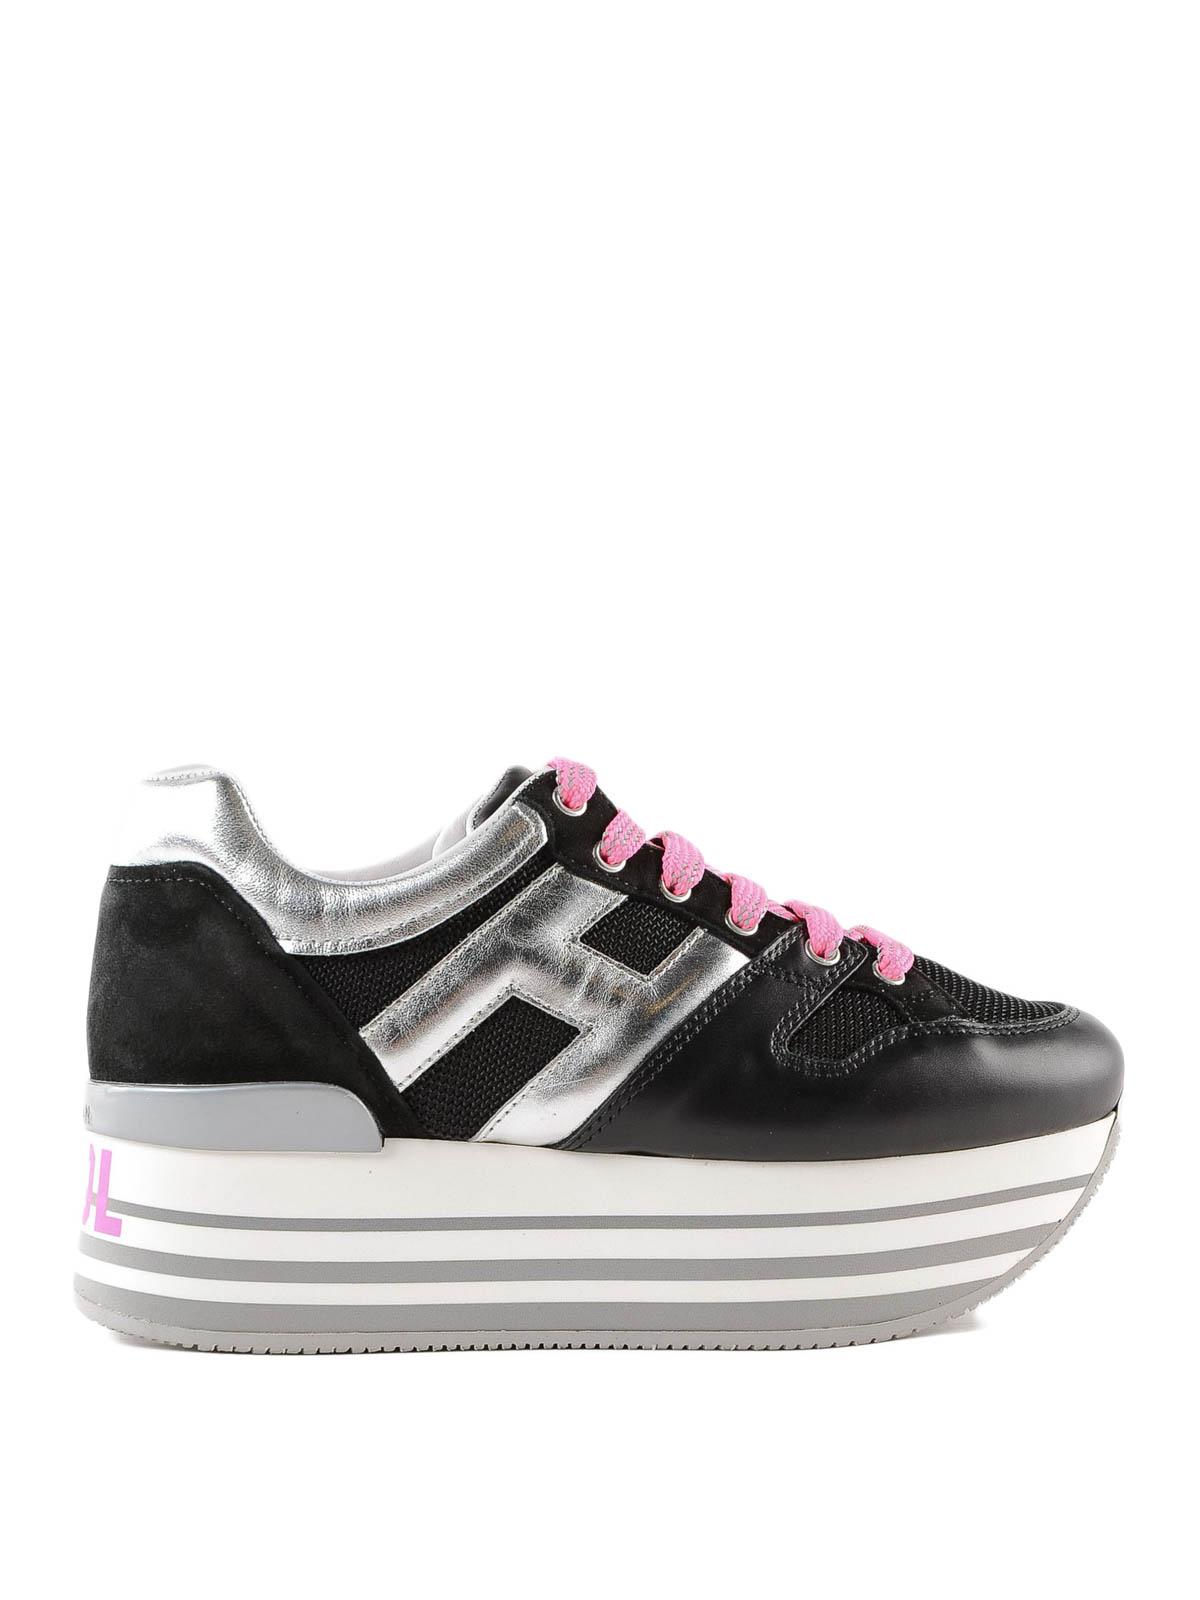 Trainers Hogan - Maxi H222 black striped platform sneakers ...